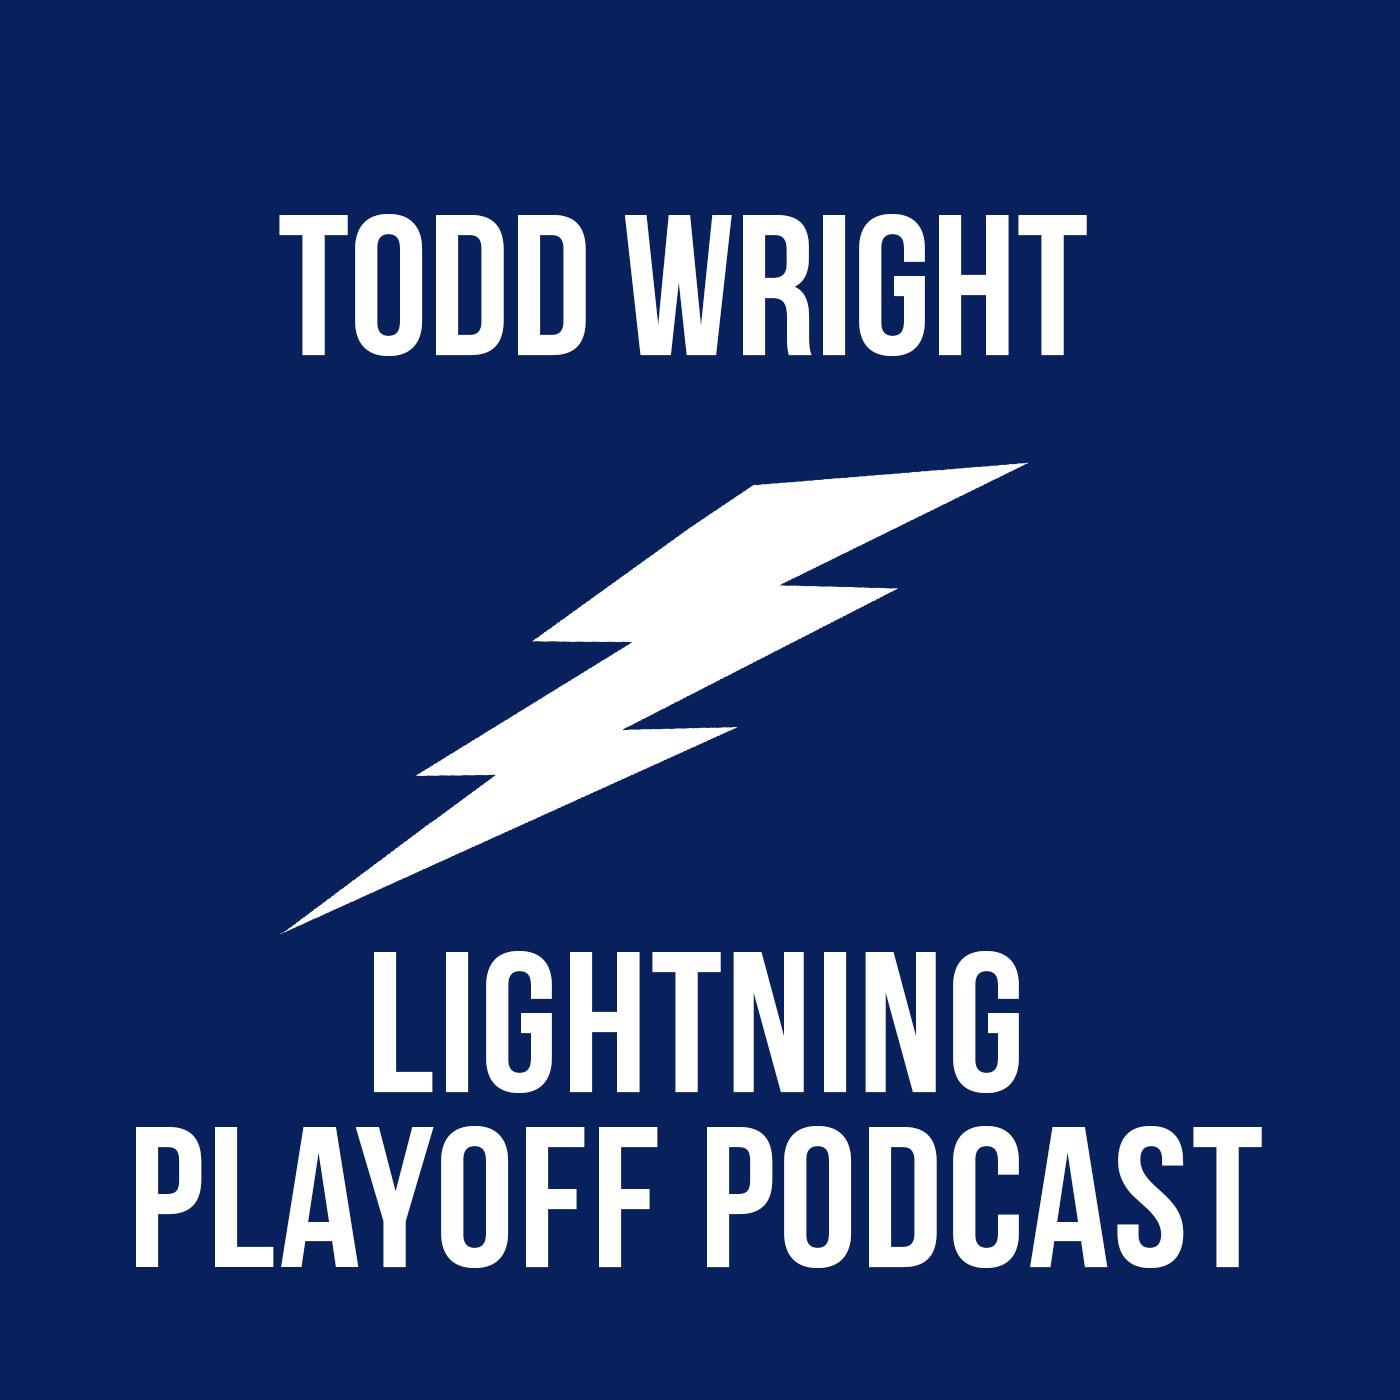 Todd Wright Lightning Playoff Podcast - TAMPA WIN CUP- Via JoeBucsFan.com